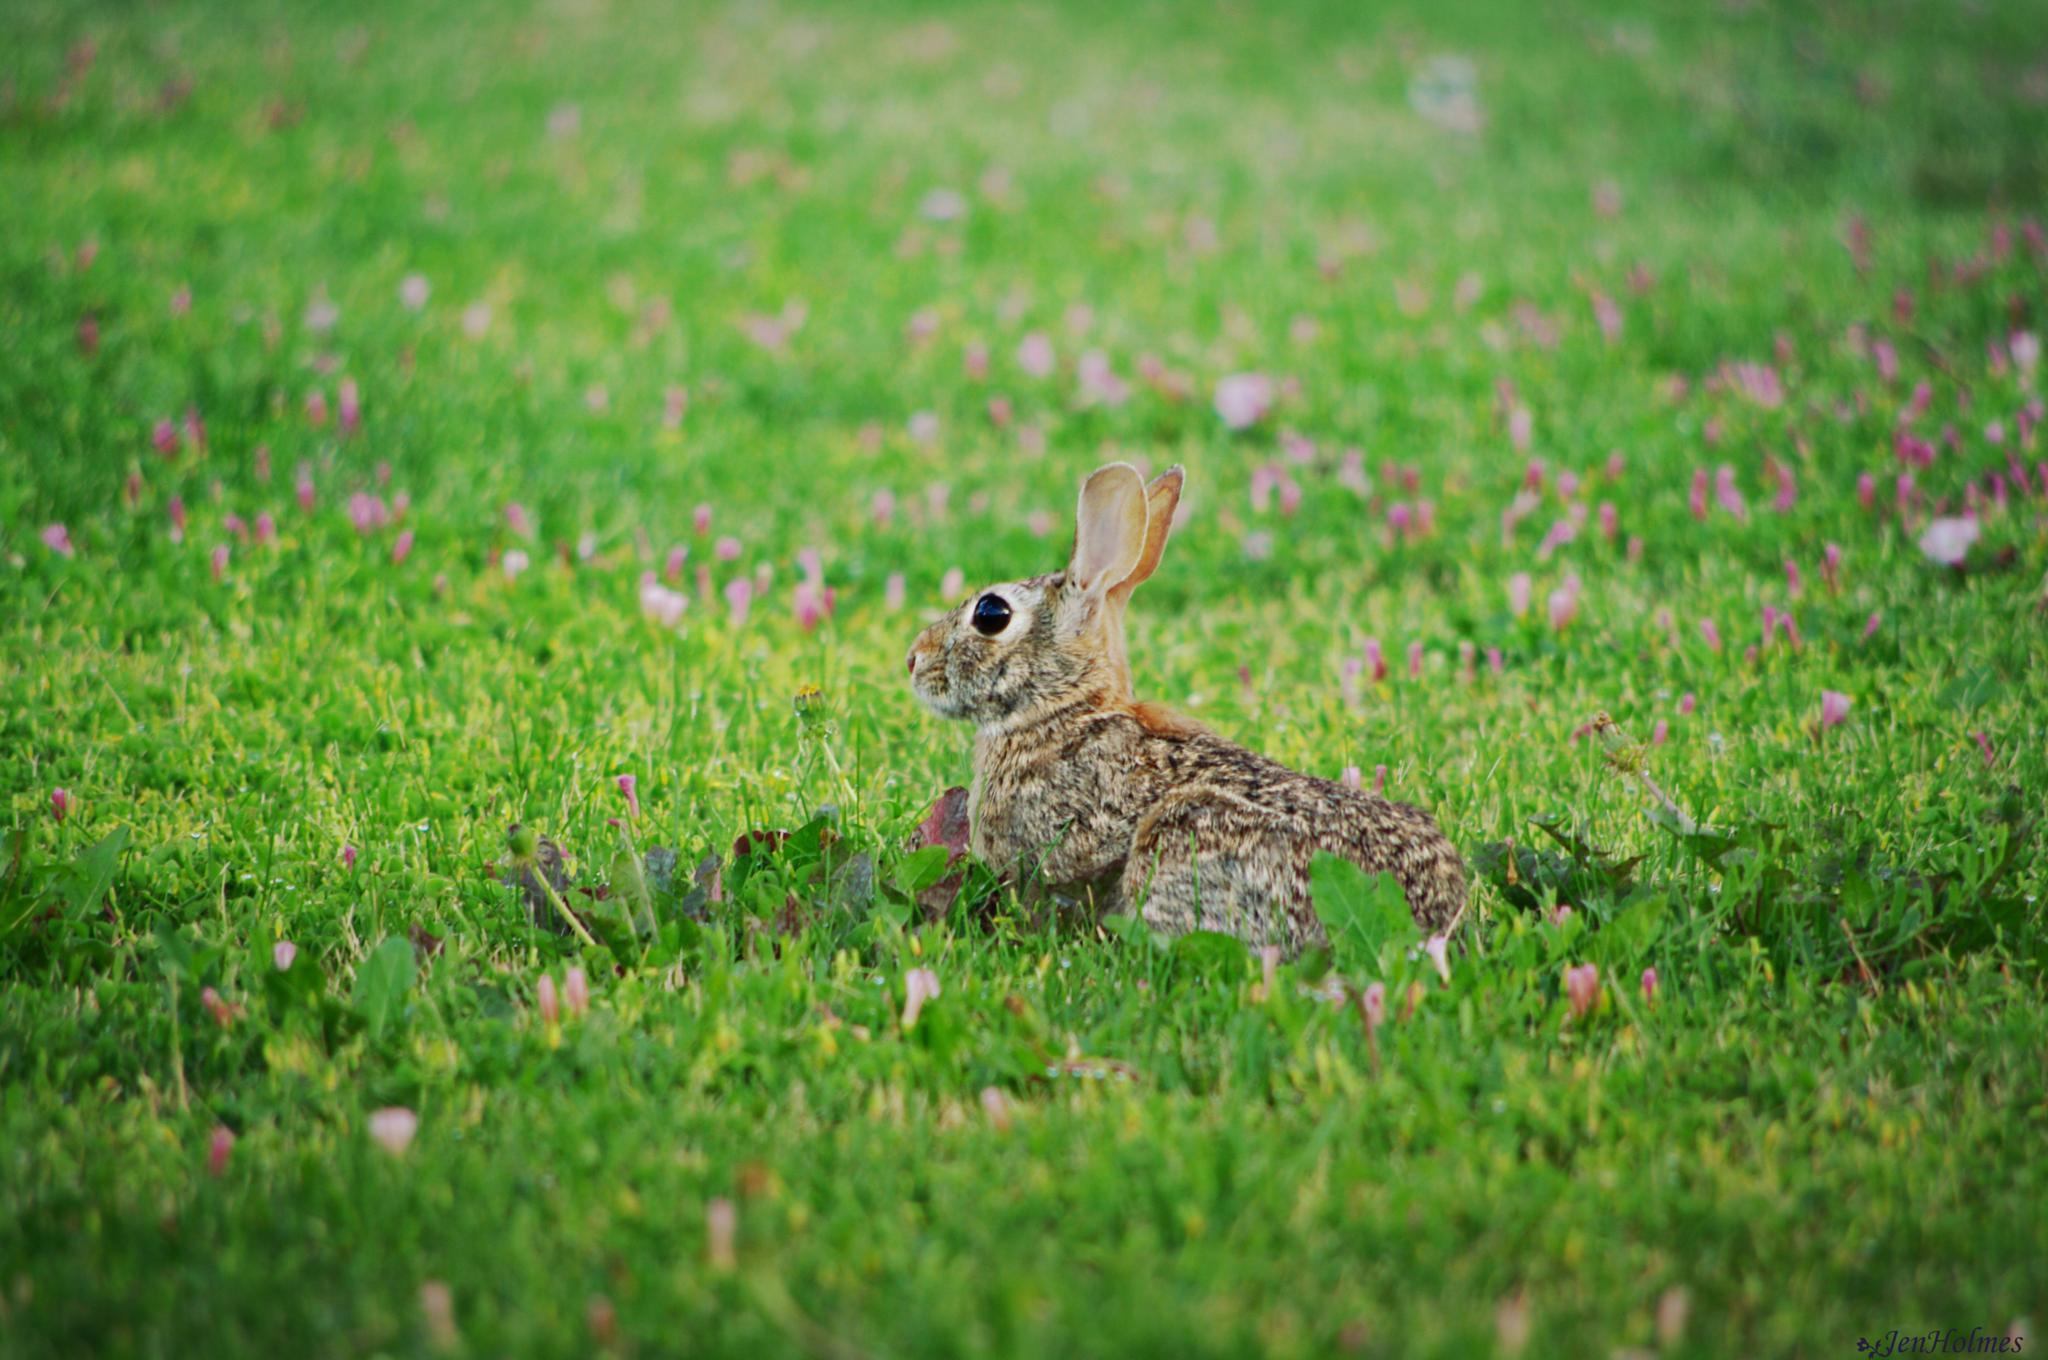 The 'Rabbit Whisperer' strikes again by jennifer.holmes.357